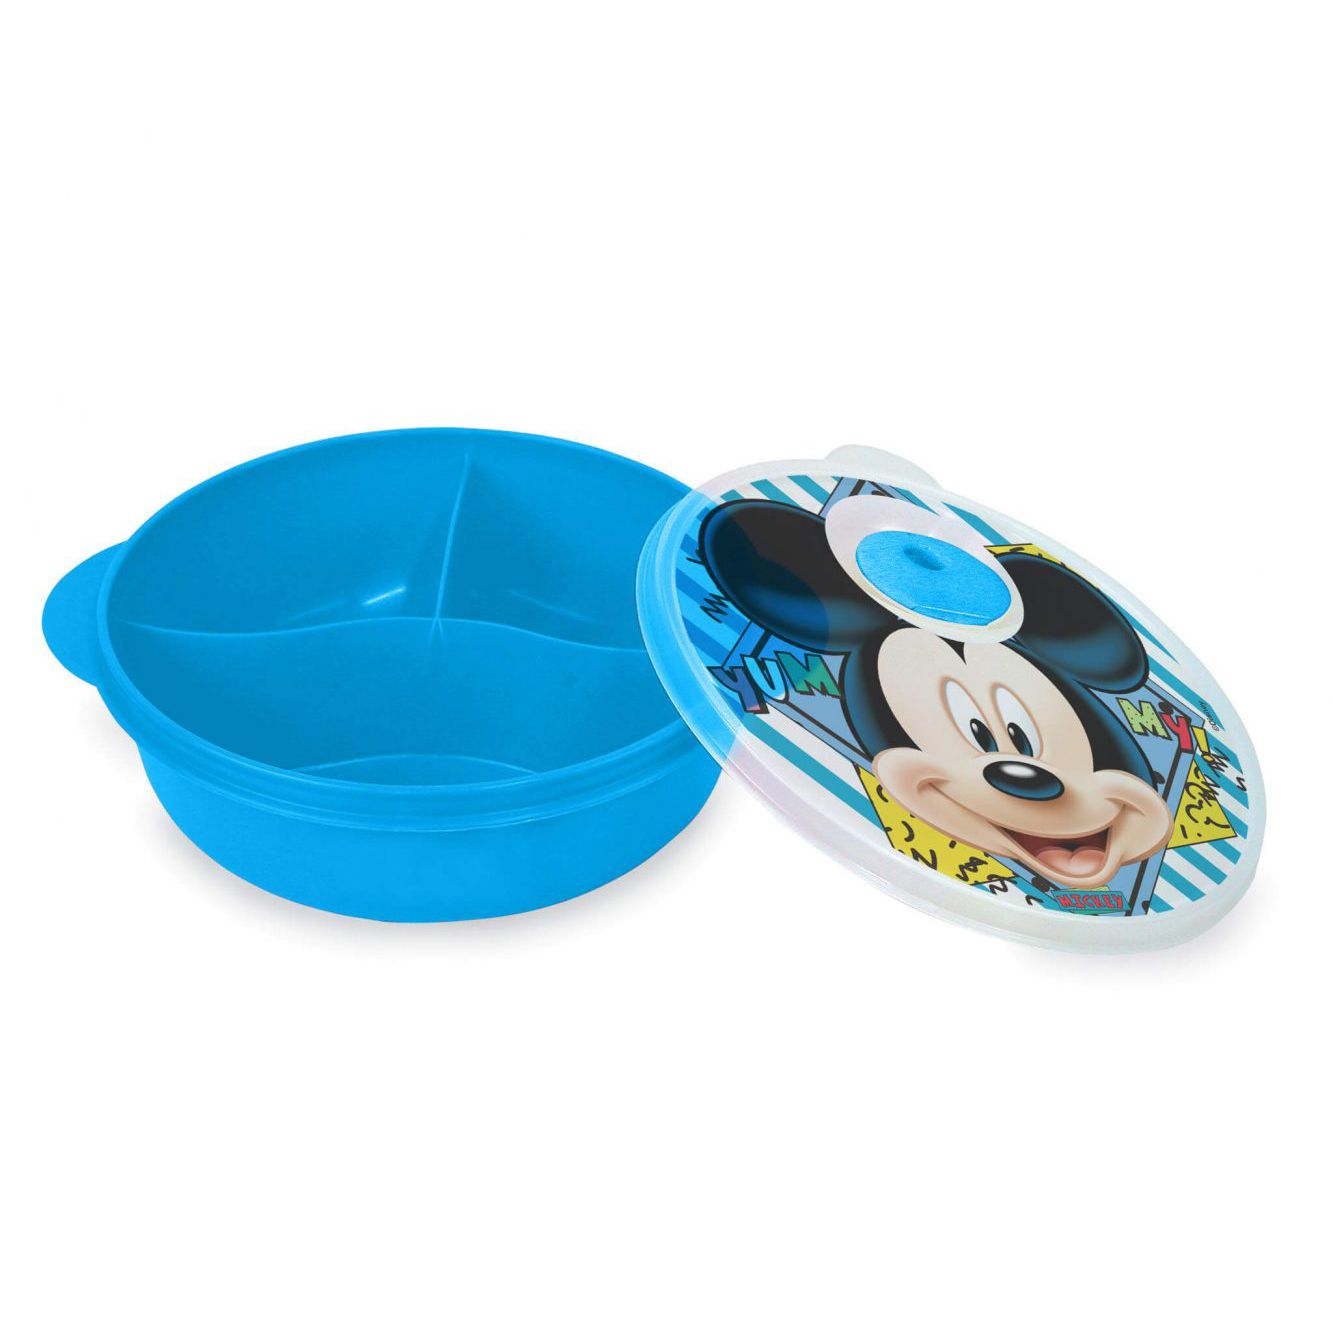 Prato c/ Divisões e Tampa p/ Micro-Ondas Disney Mickey Baby 1291